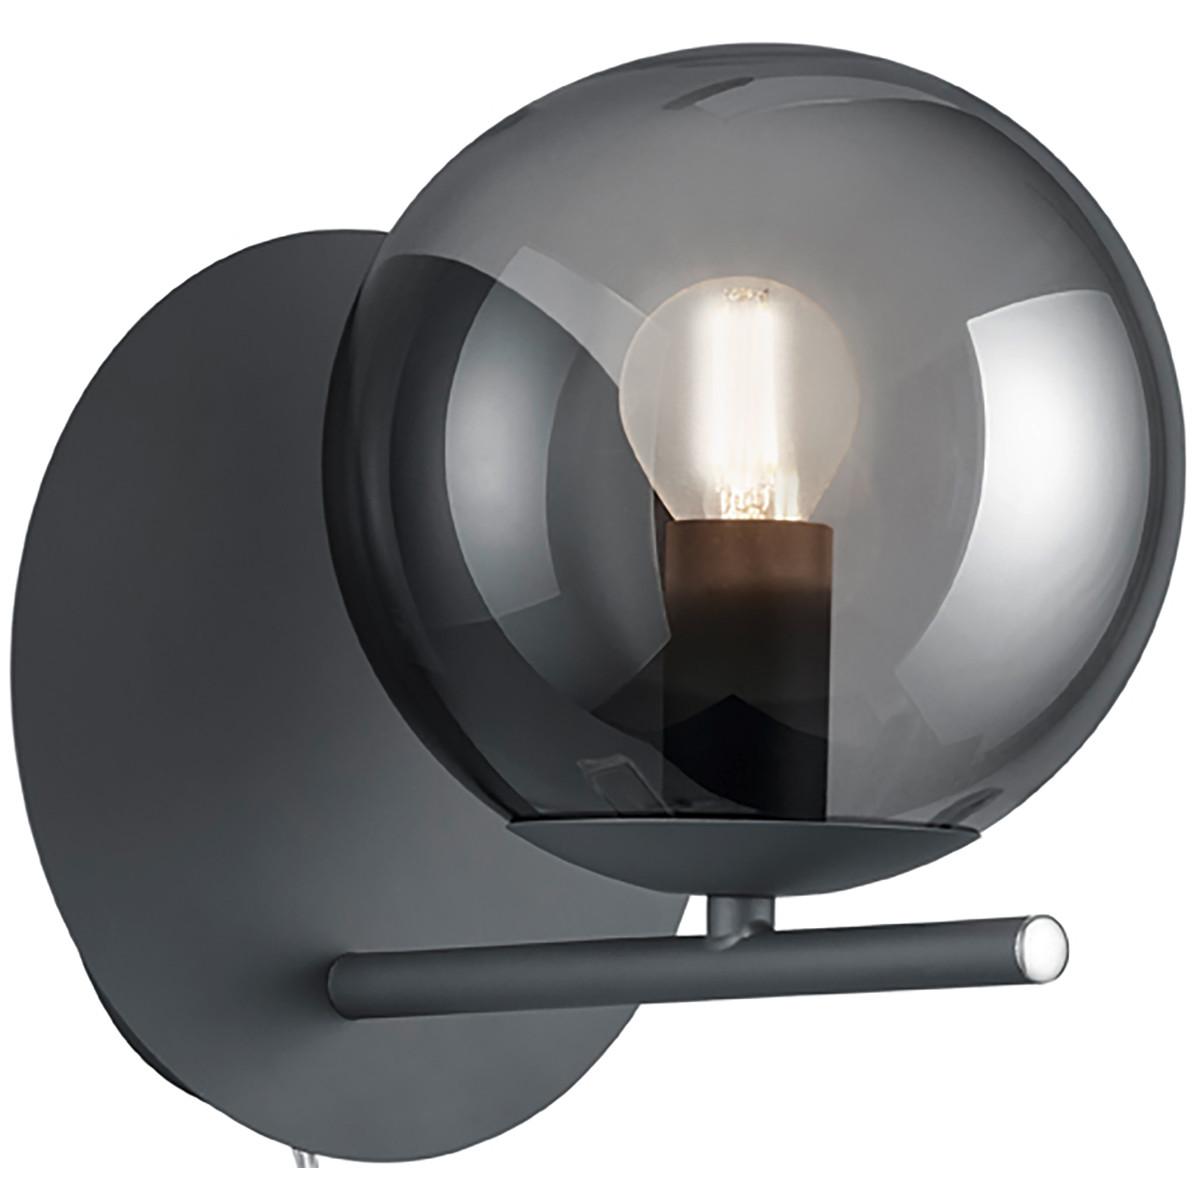 LED Wandlamp - Wandverlichting - Trion Pora - E14 Fitting - Rond - Mat Zwart - Aluminium